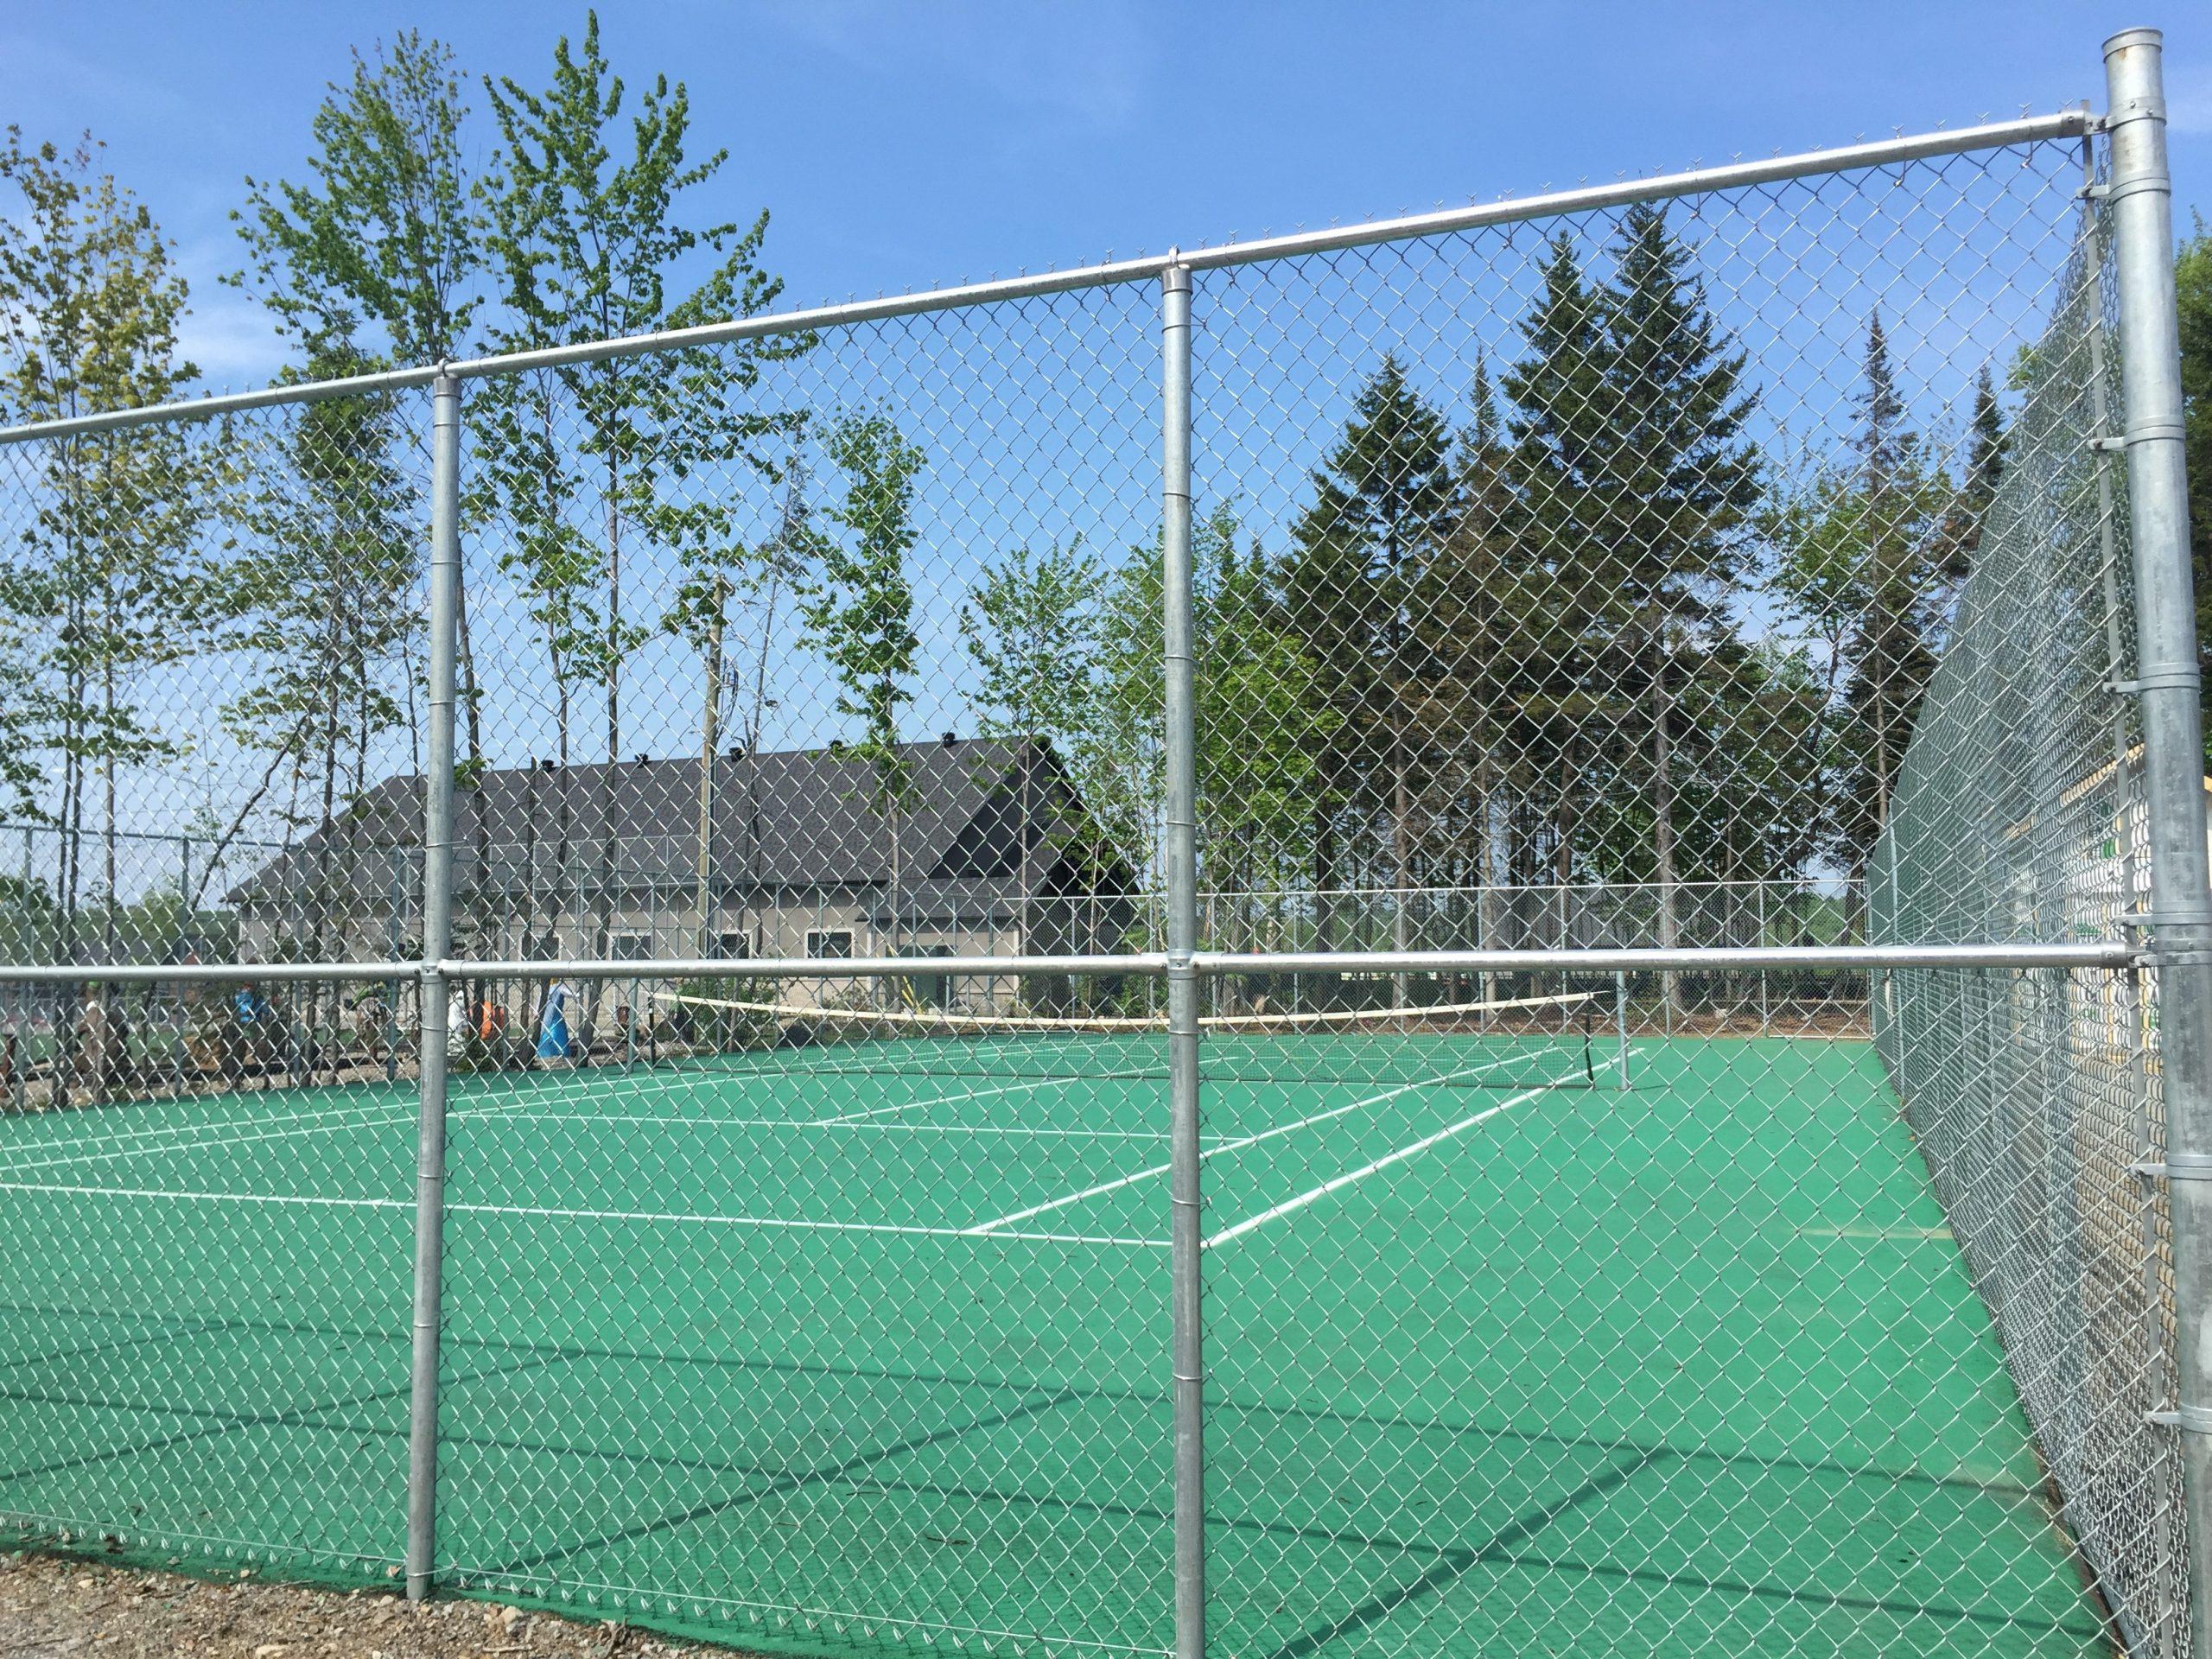 http://www.campingatlantide.com/wp-content/uploads/2020/04/tennis-scaled.jpg